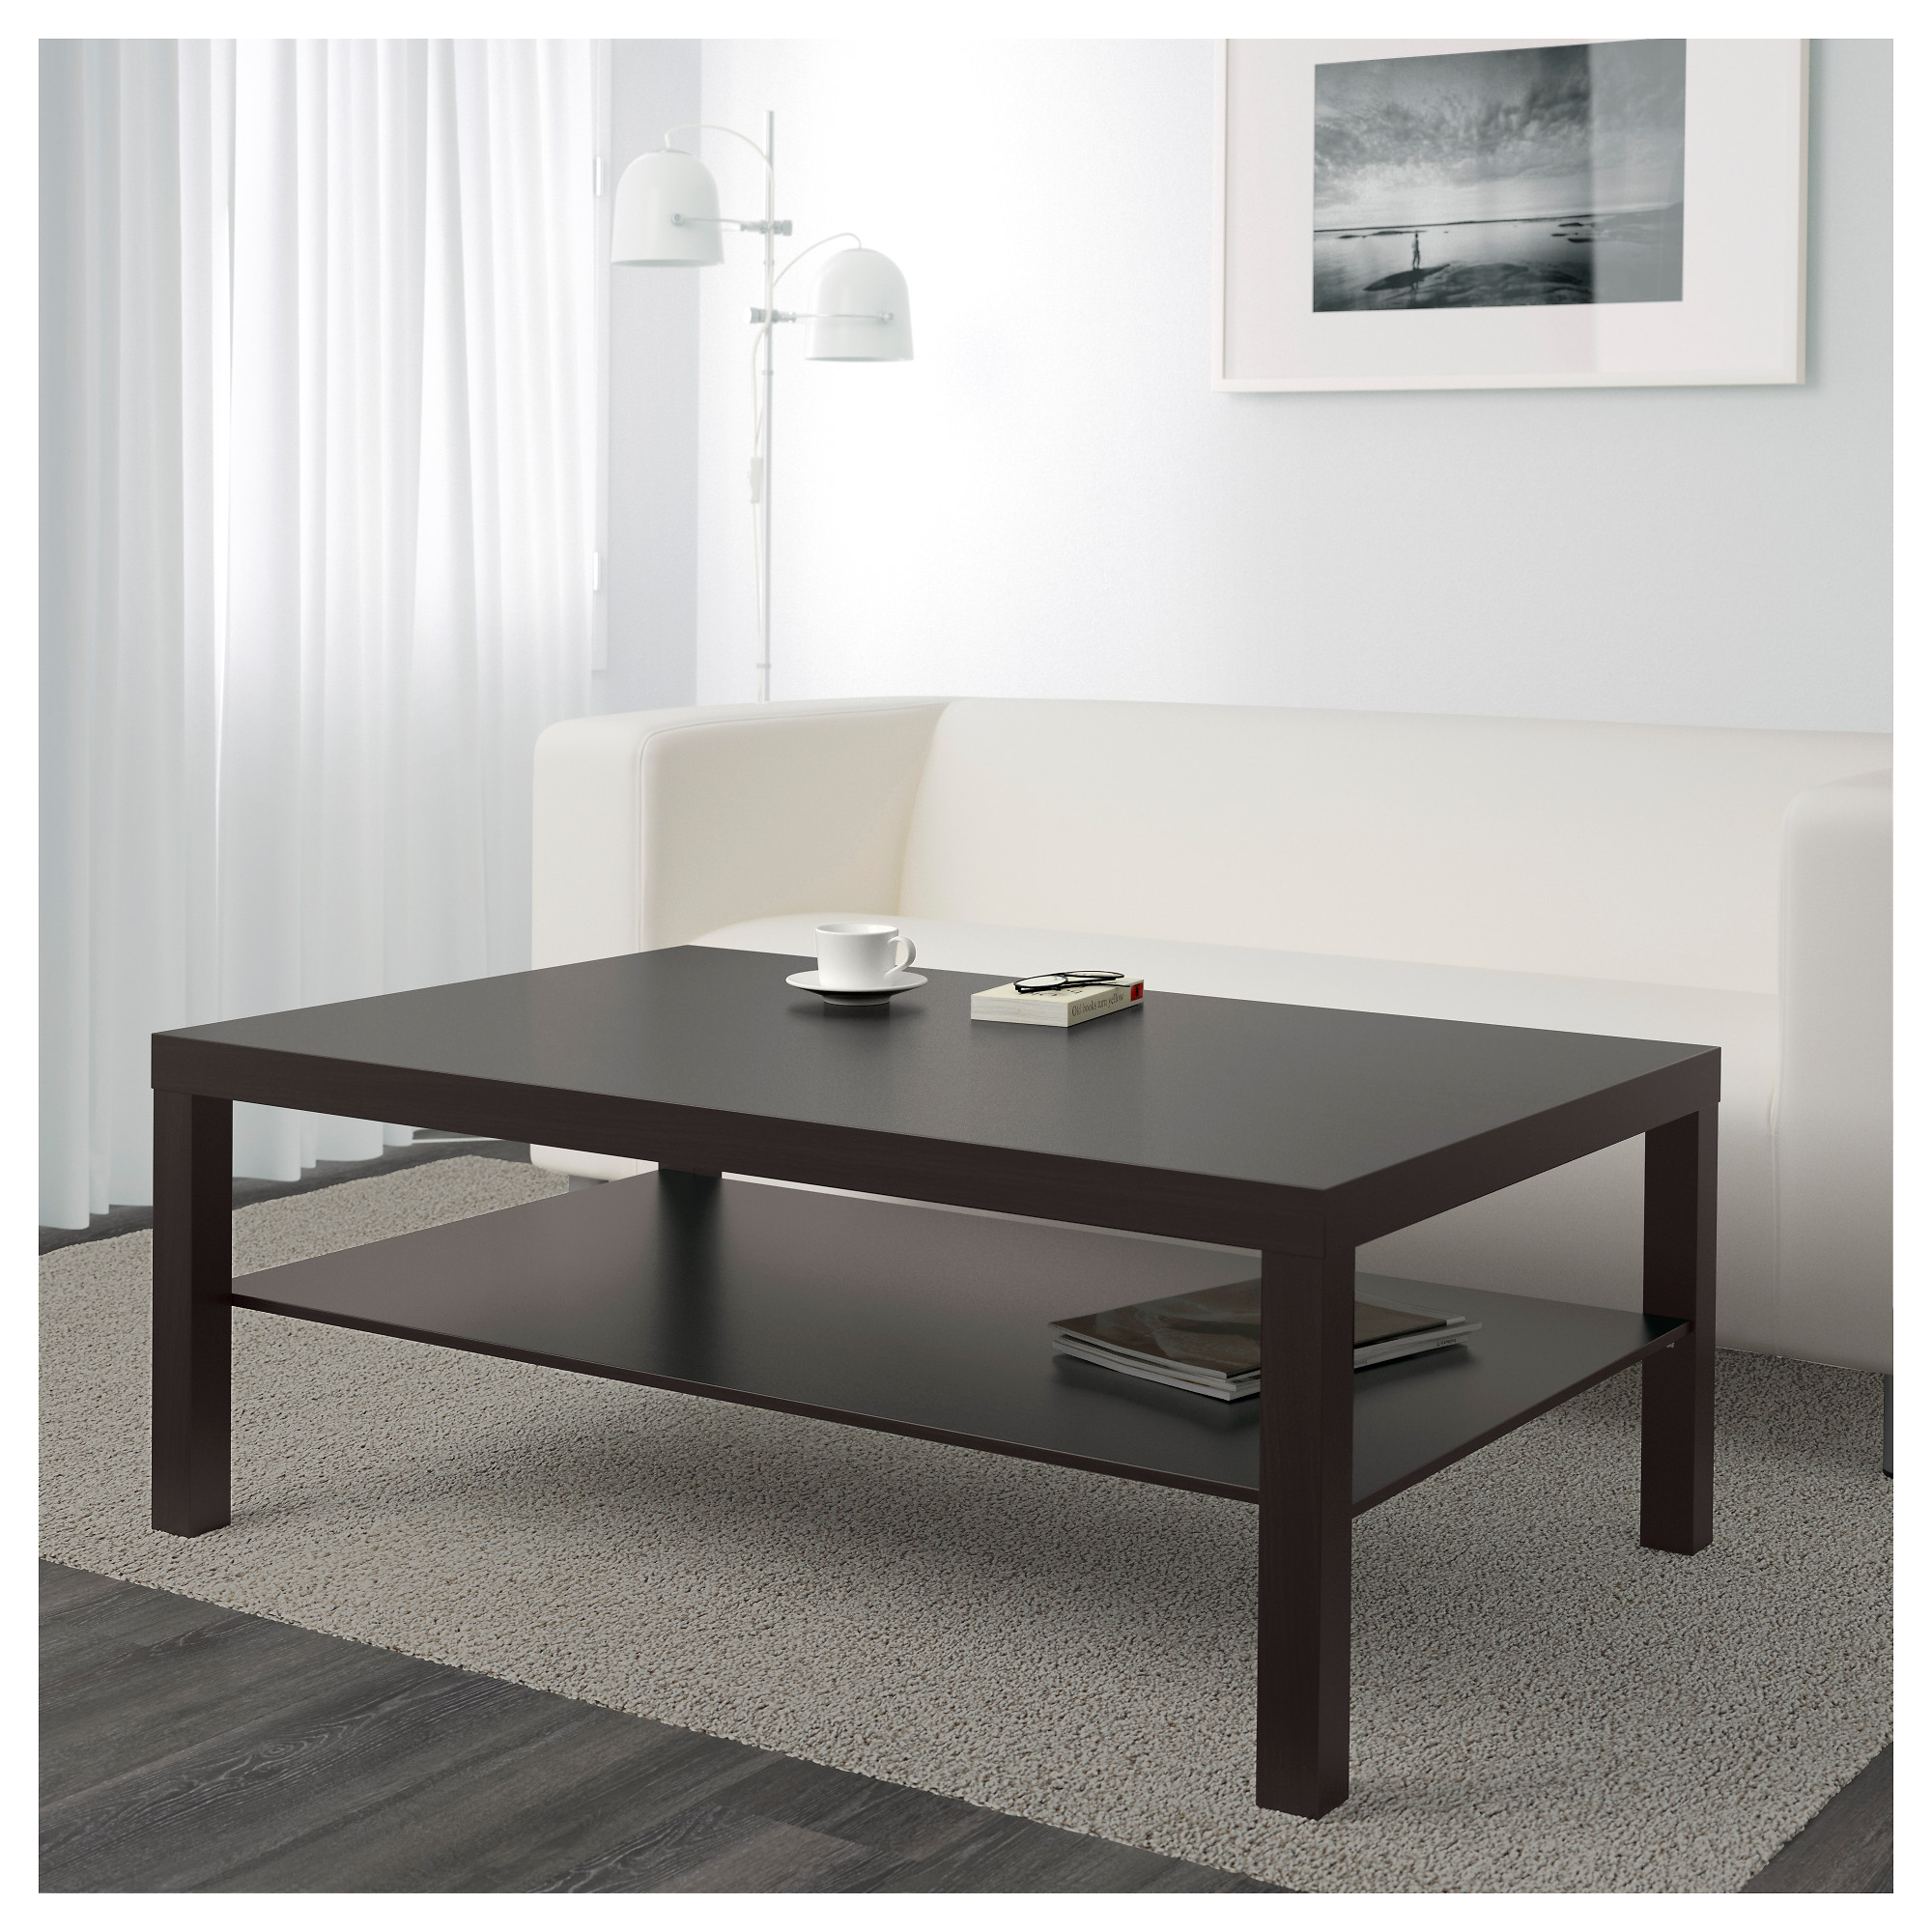 - LACK - Coffee Table, Black-brown IKEA Hong Kong